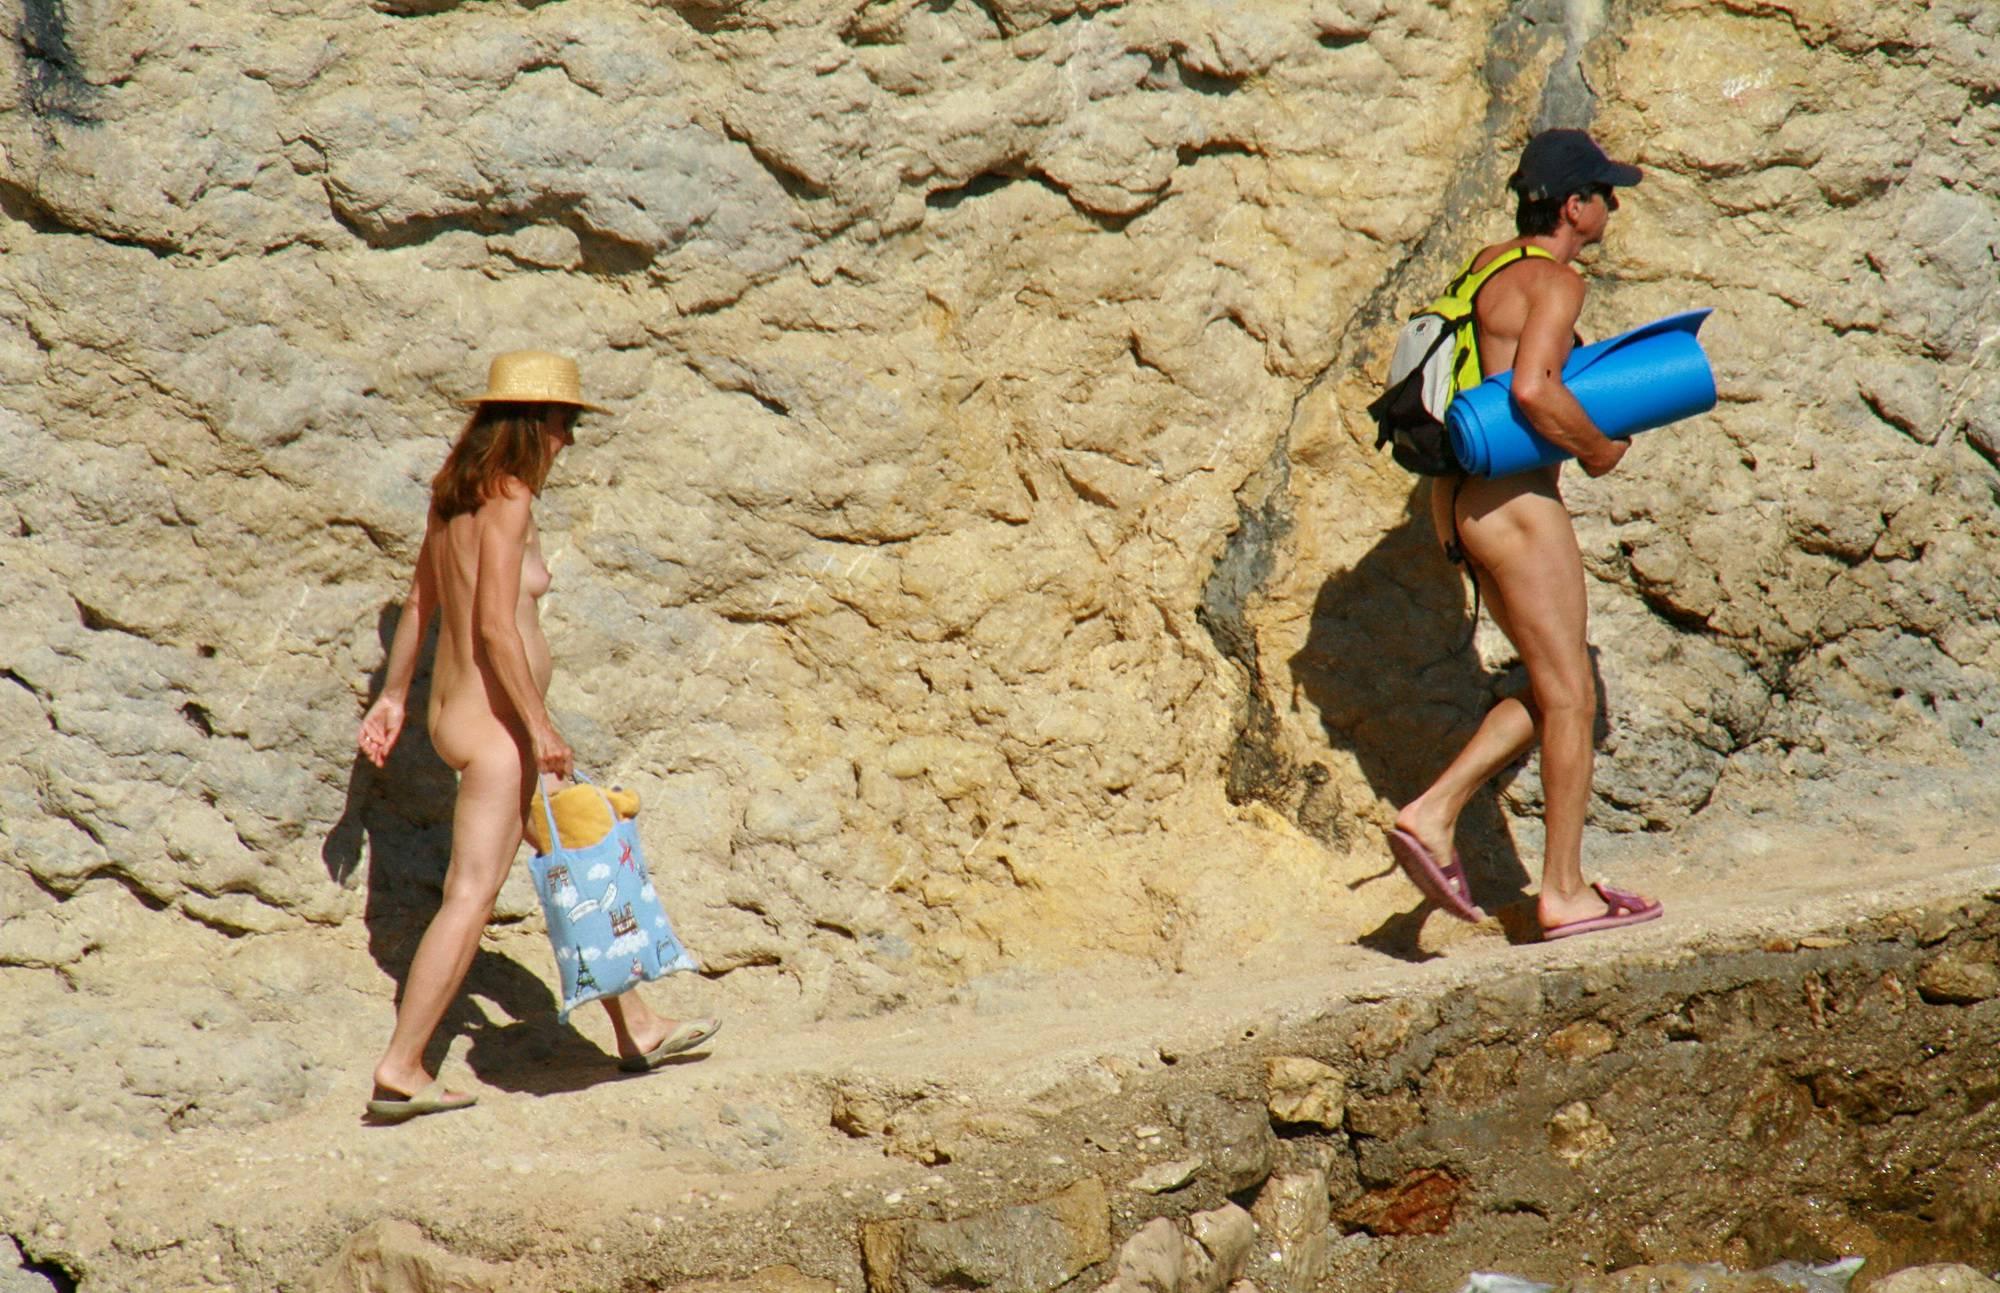 Nudist Mountain Climbers - 1